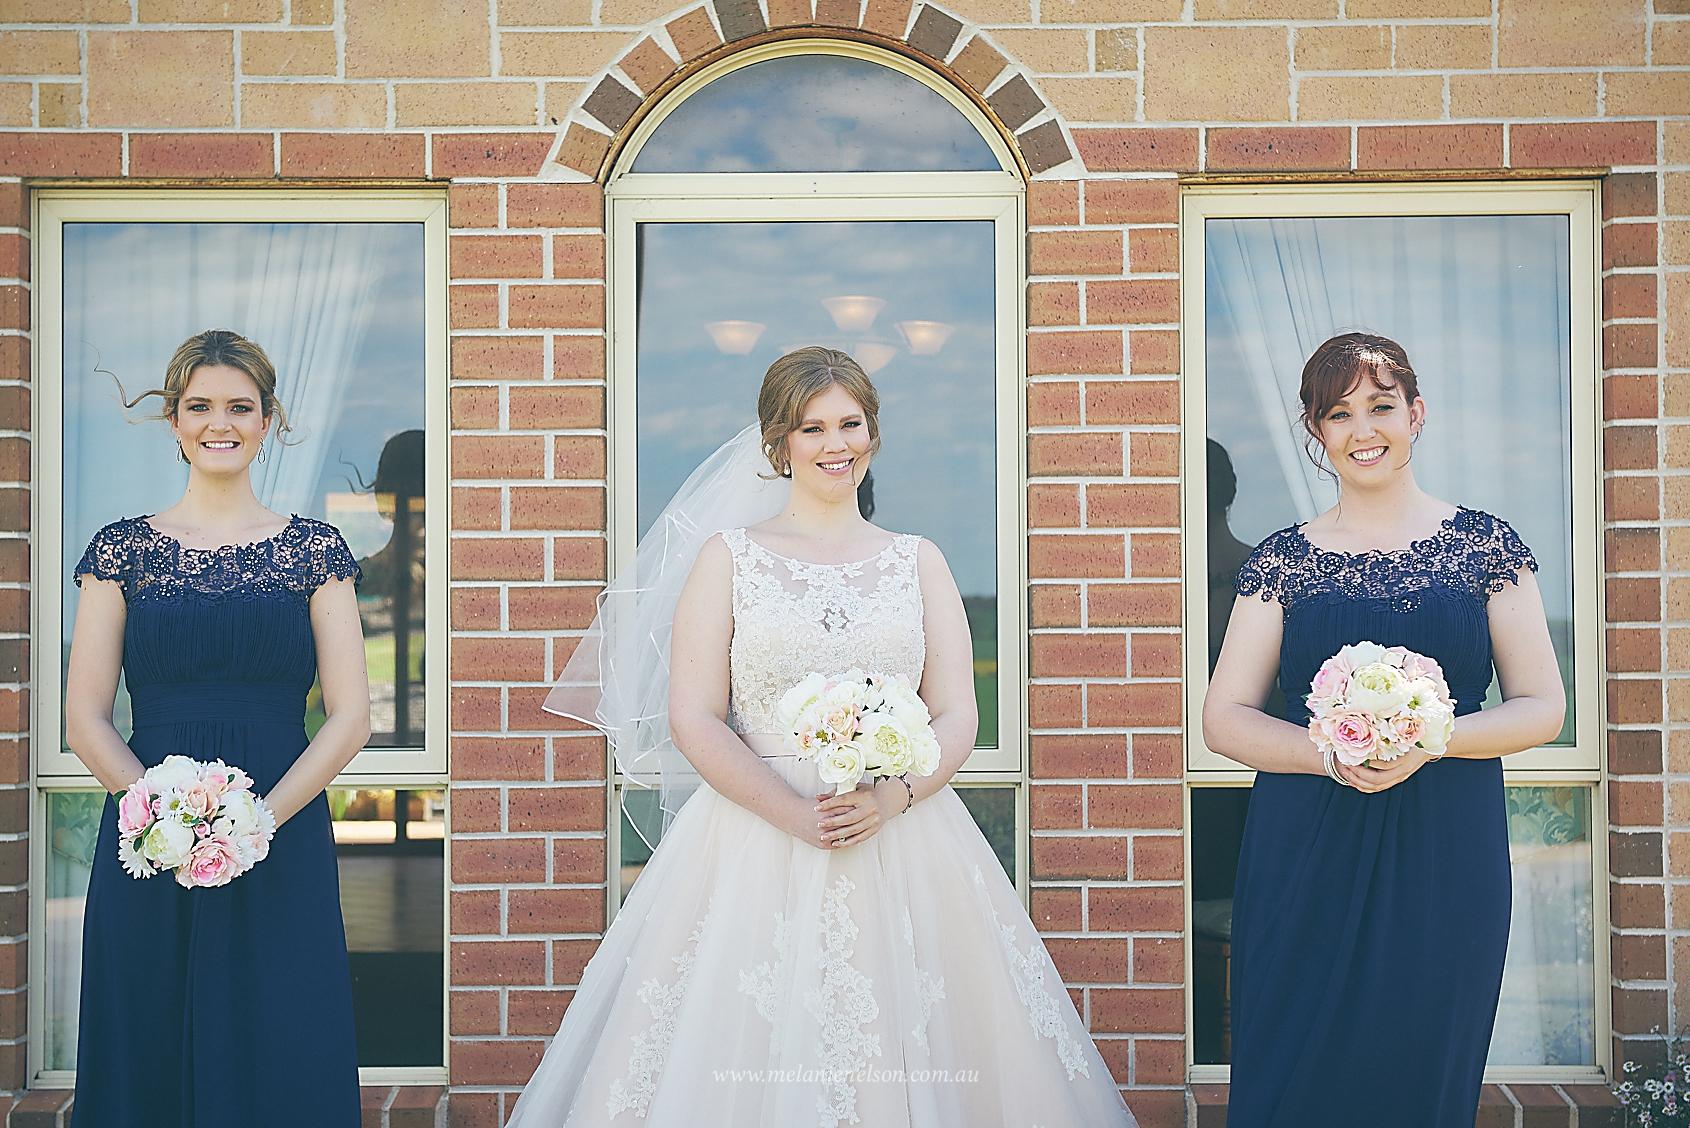 yorke_peninsula_wedding_photographer_0020.jpg